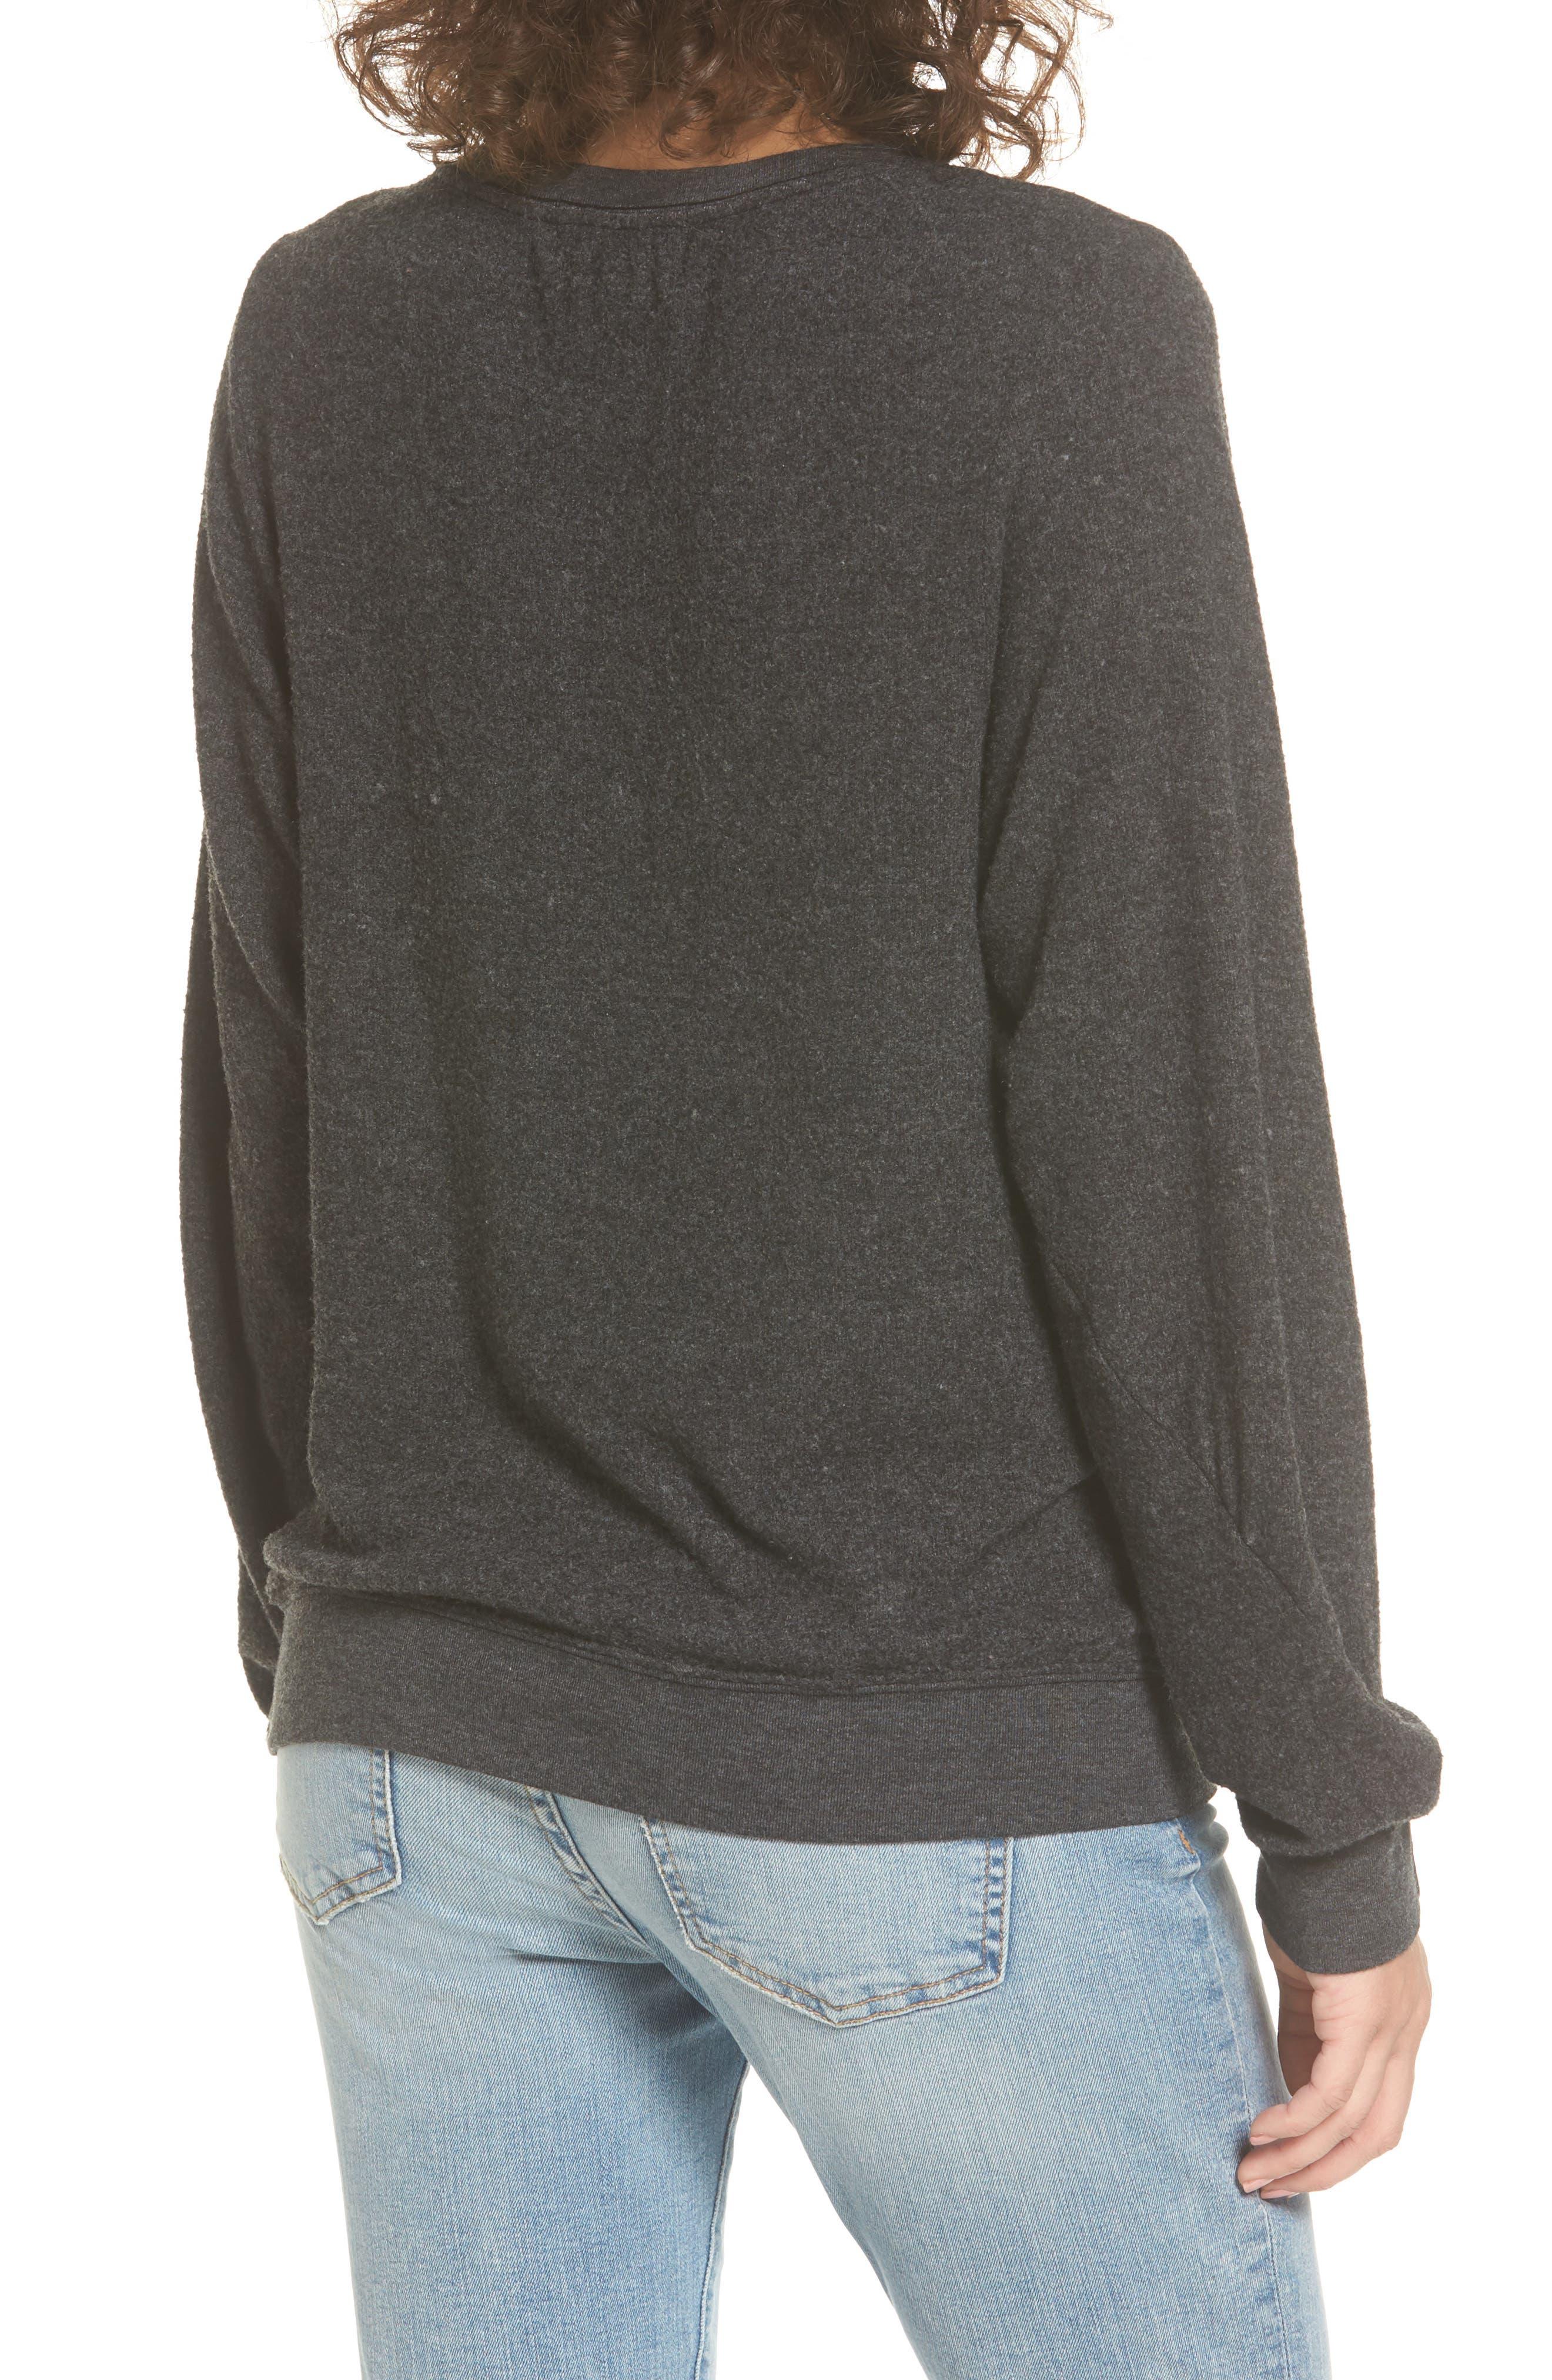 Champagne Champion Sweatshirt,                             Alternate thumbnail 2, color,                             001